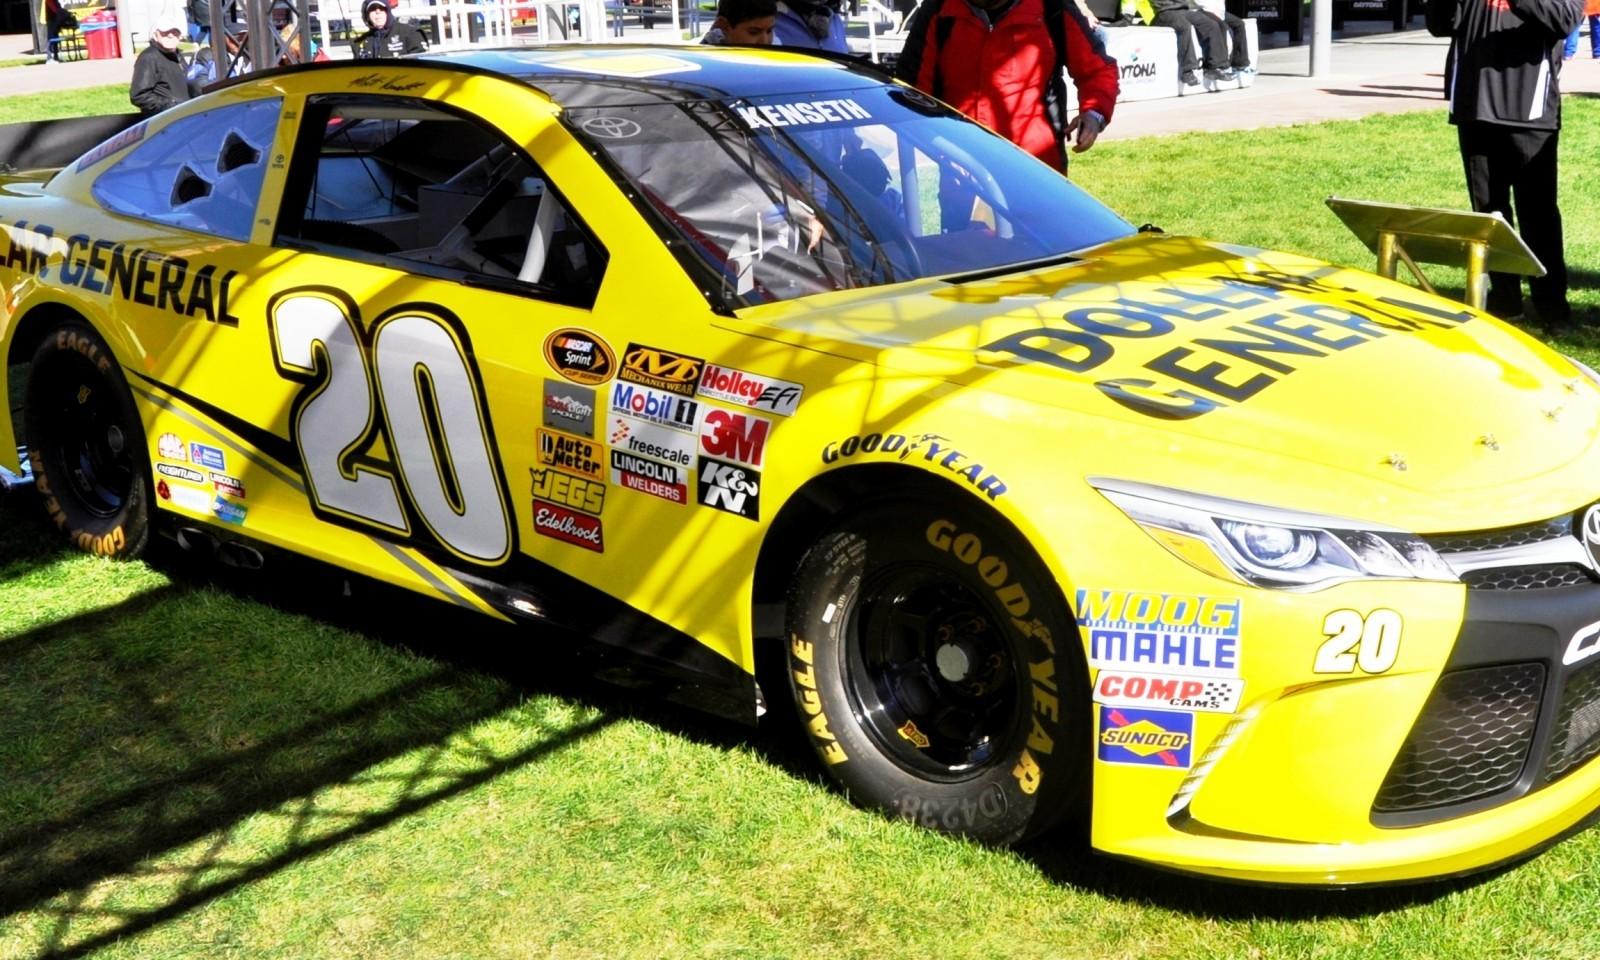 2015 Toyota Camry NASCAR Dollar General 40